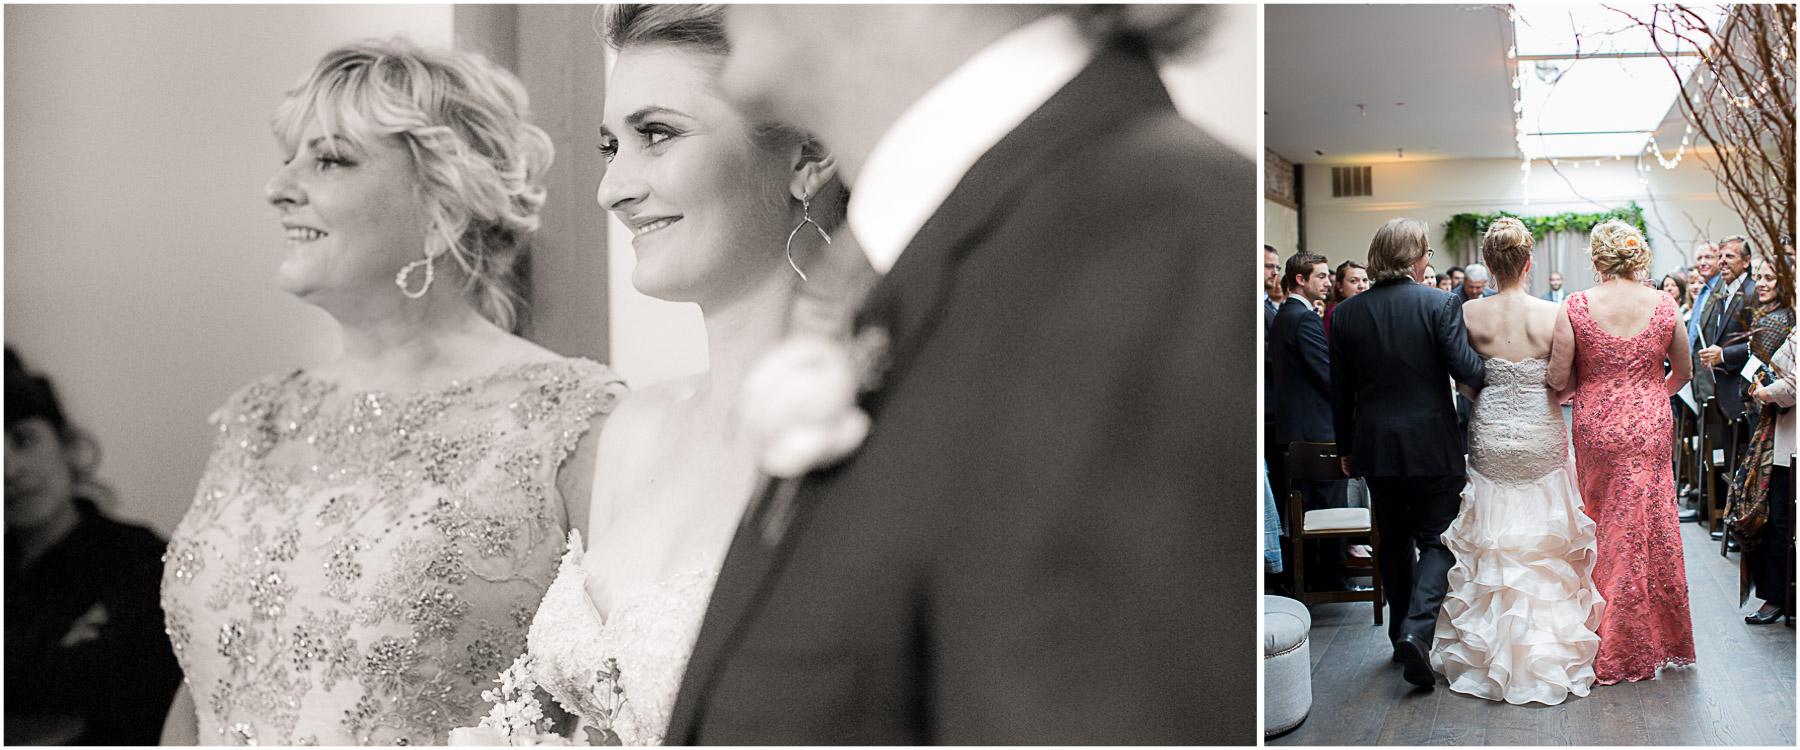 JennaBethPhotography-LEWedding-12.jpg